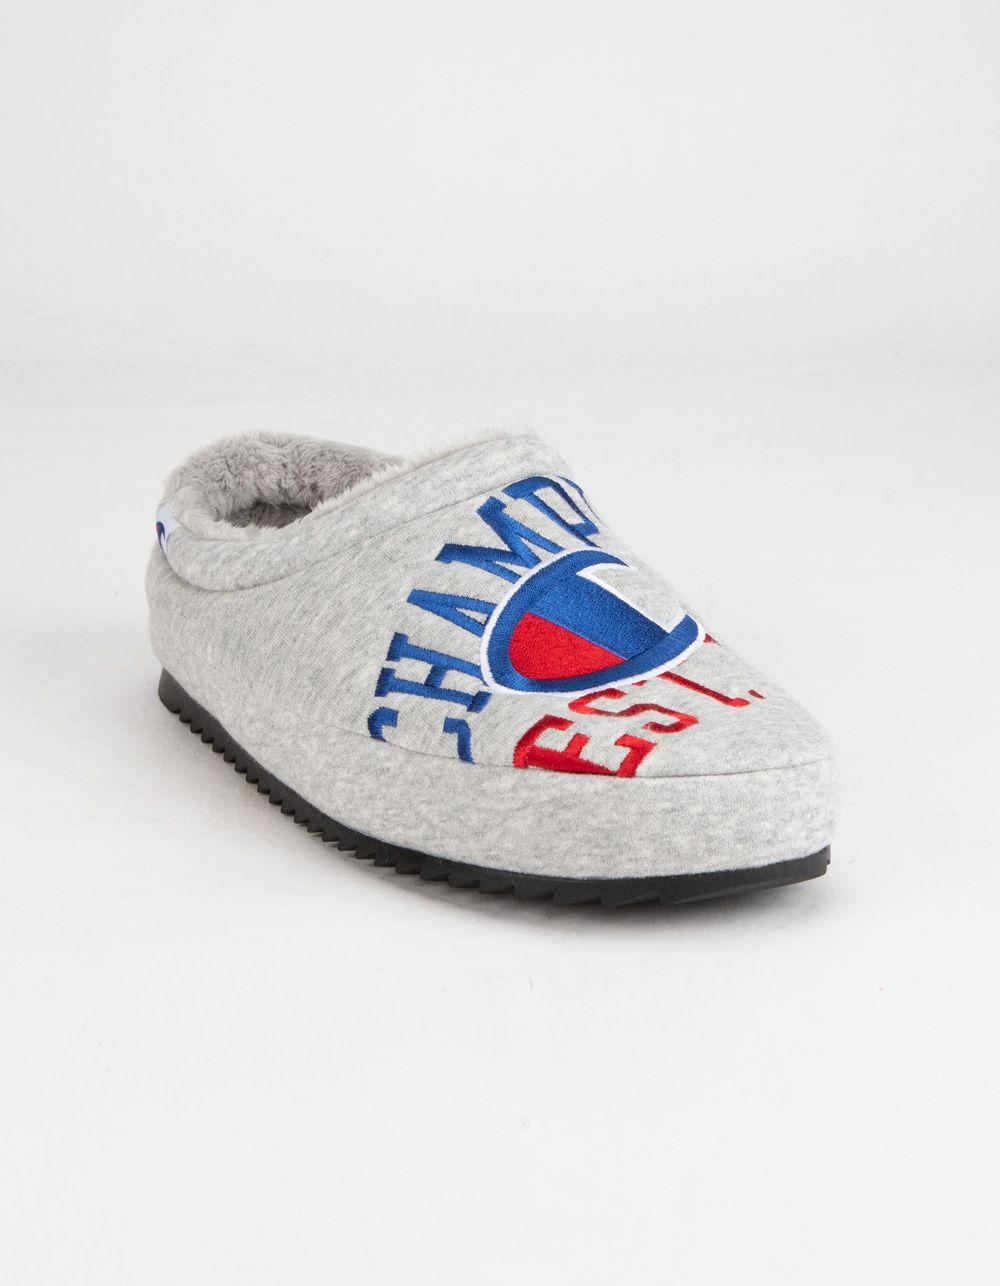 Champion Shuffle Reverse Weave Mens Slippers Gray 380168115 In 2021 Mens Slippers Slippers Athletic Inspired [ 1286 x 1000 Pixel ]